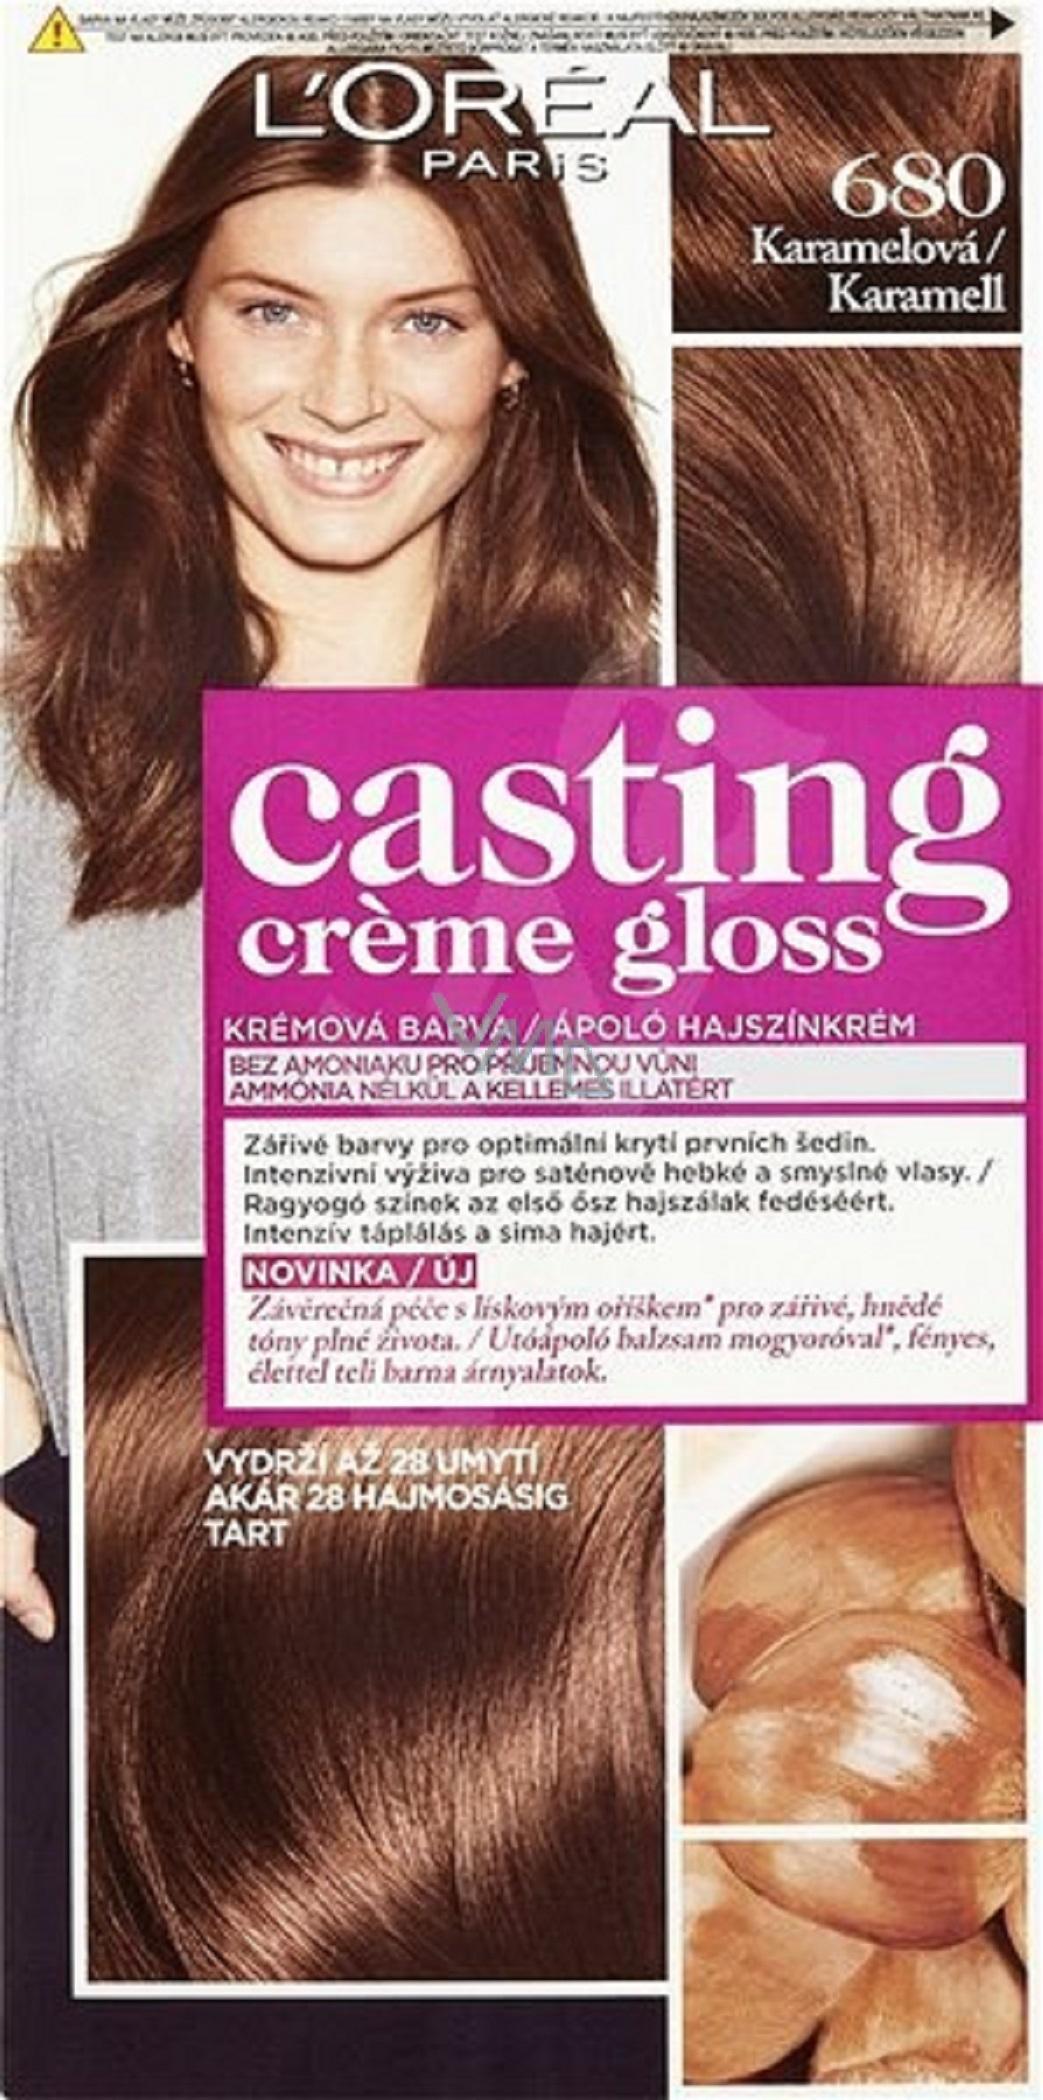 Loreal Paris Casting Creme Gloss Hair Color 680 Vmd Parfumerie